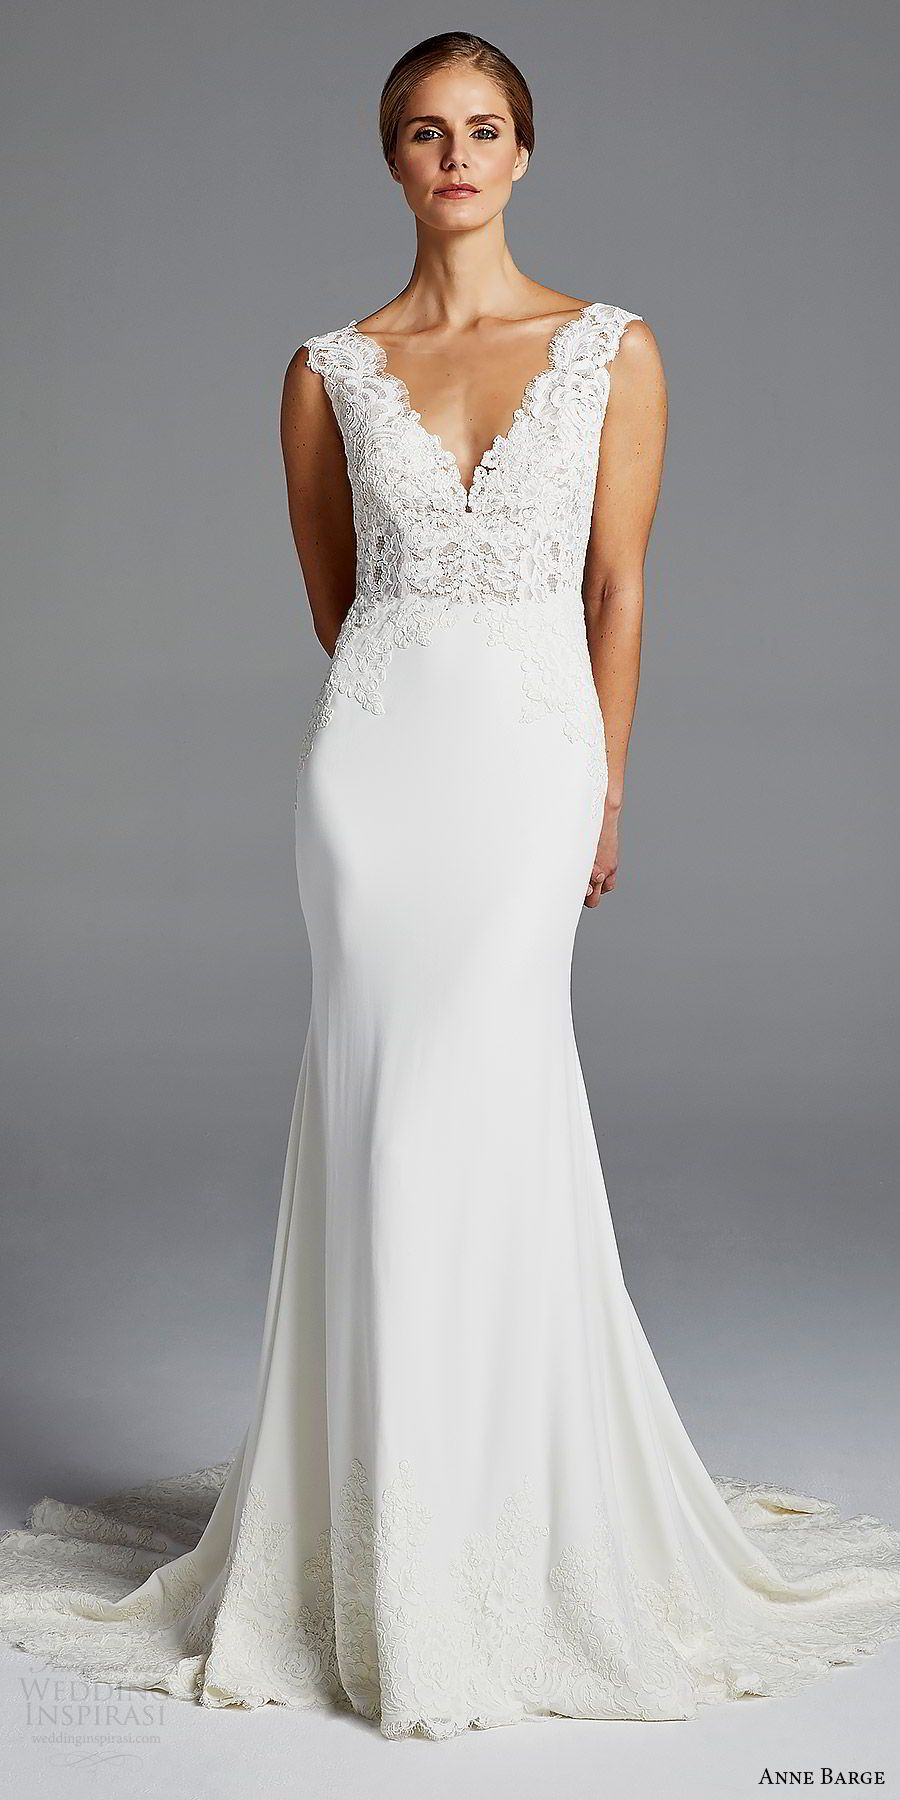 Anne Barge Spring 2019 Wedding Dresses | Anne barge wedding